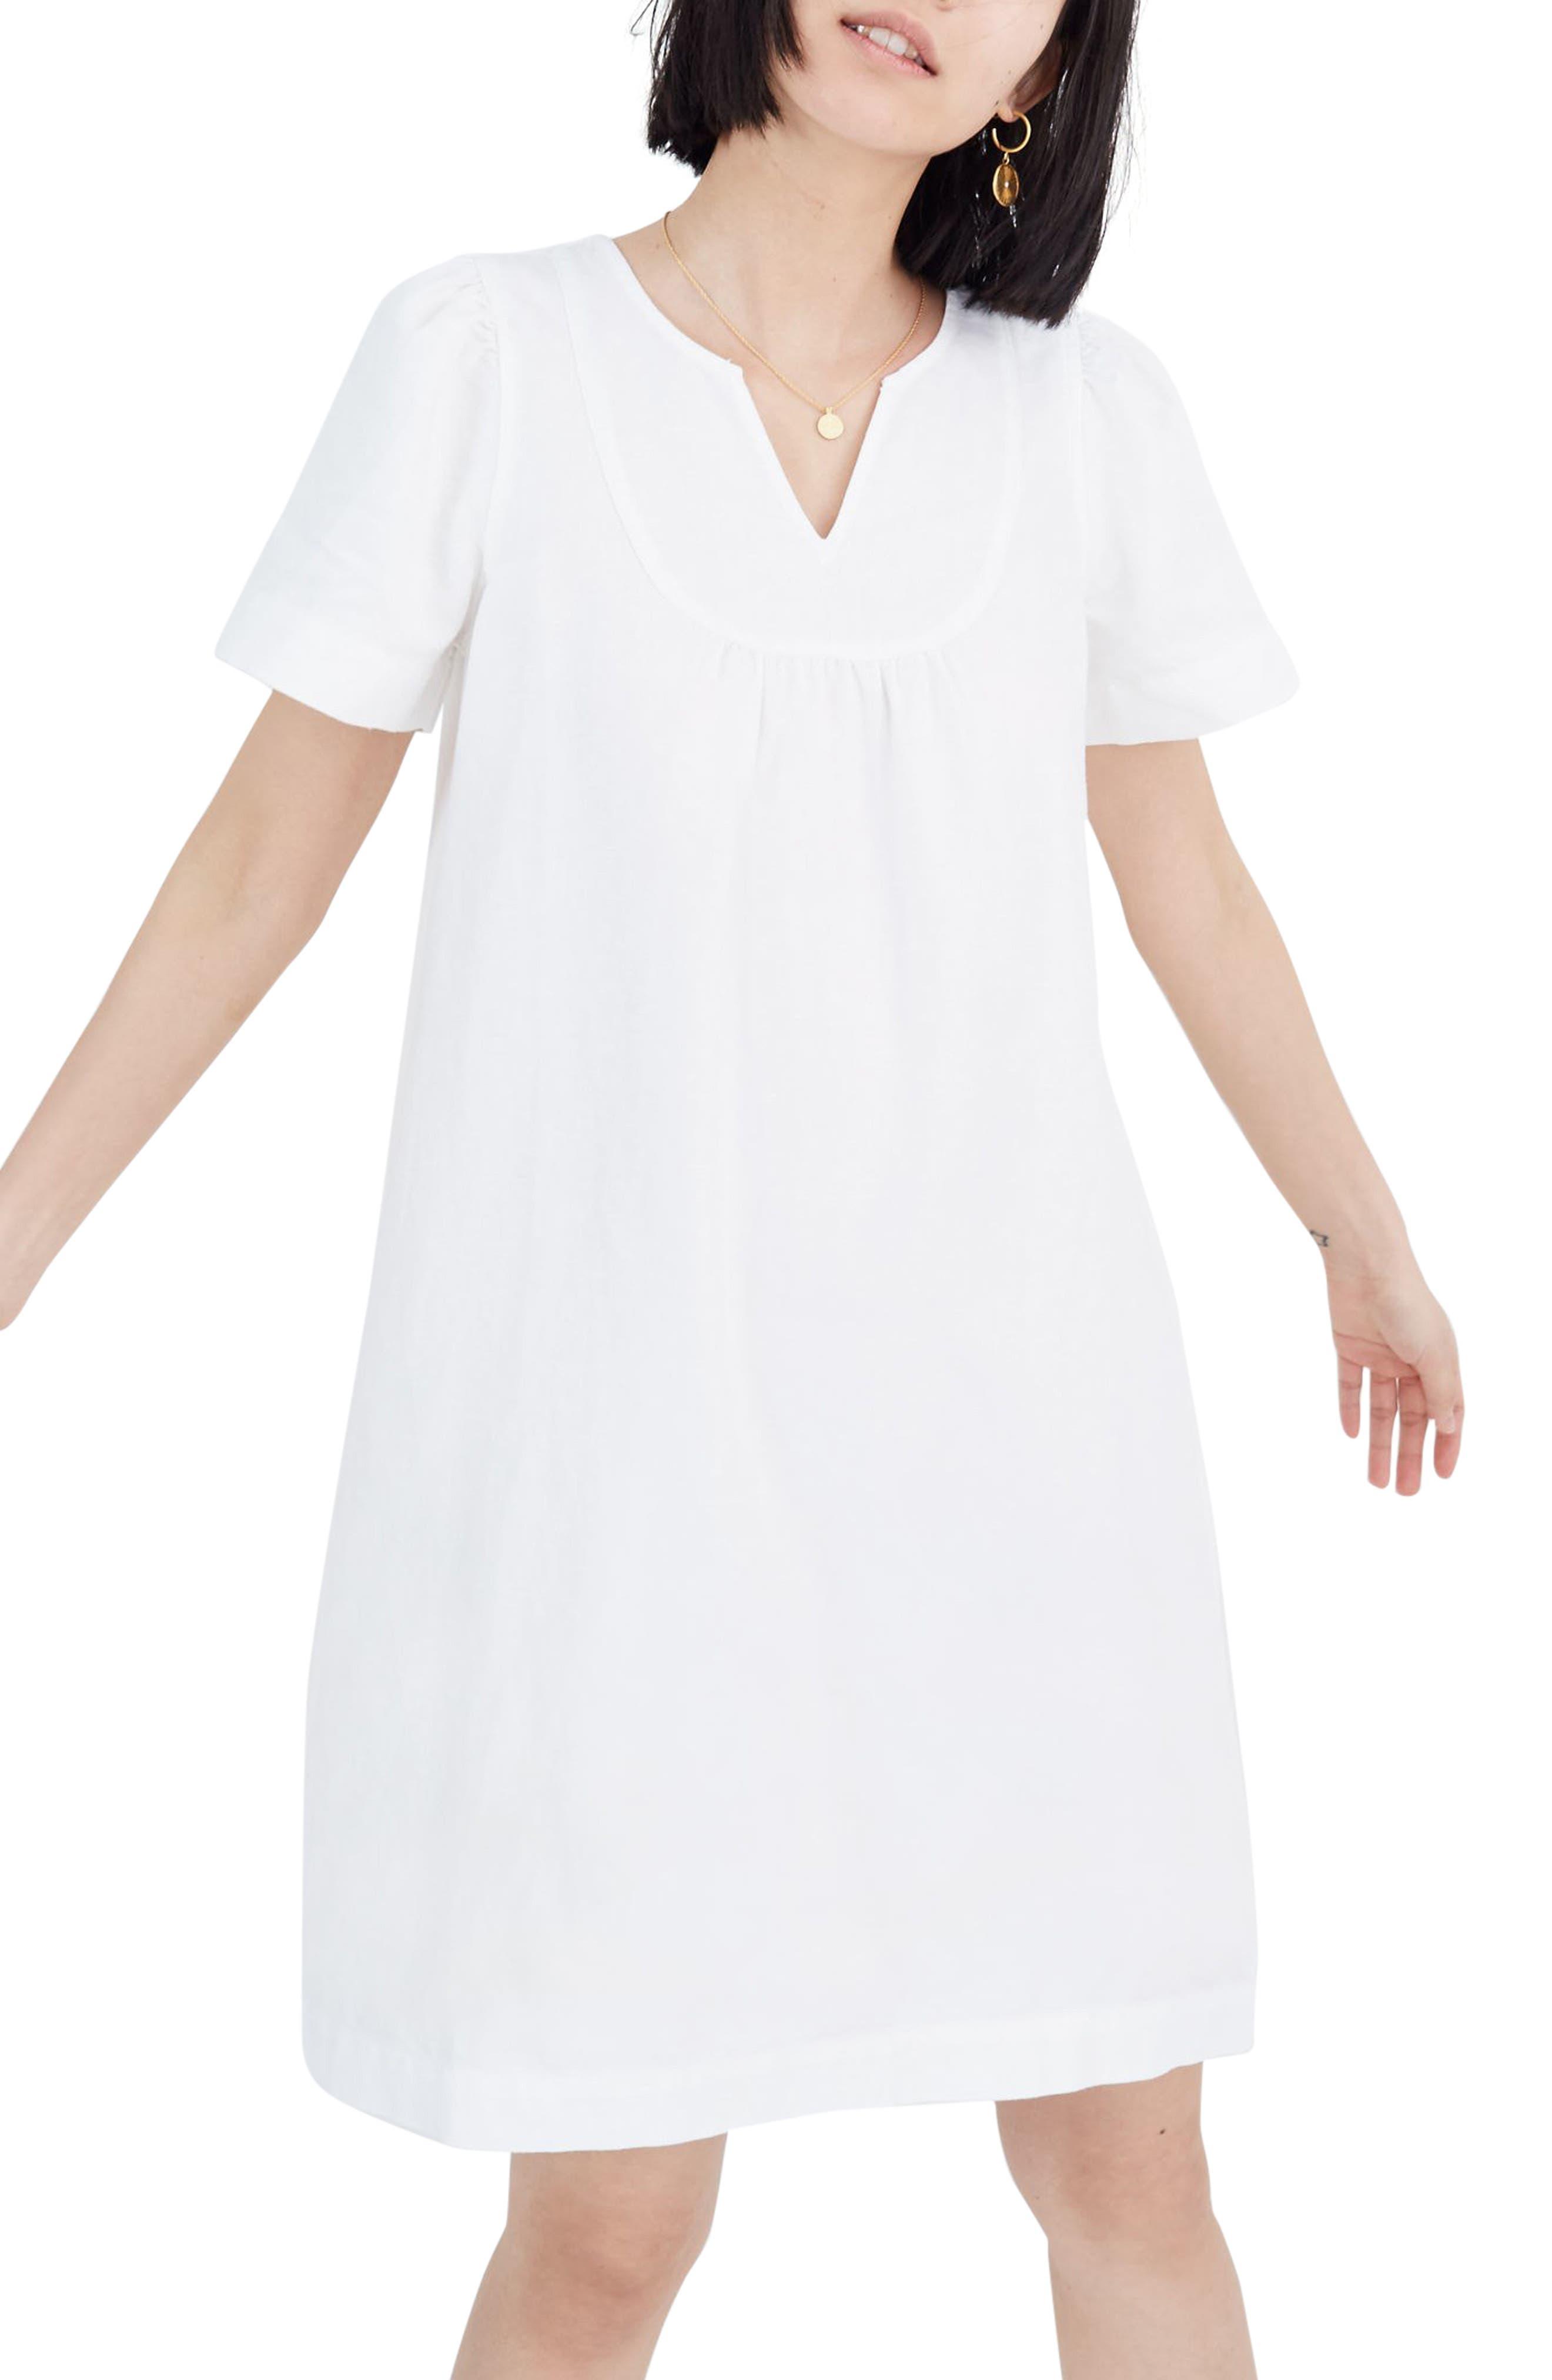 Madewell Popover Pure White Denim Swing Dress, White